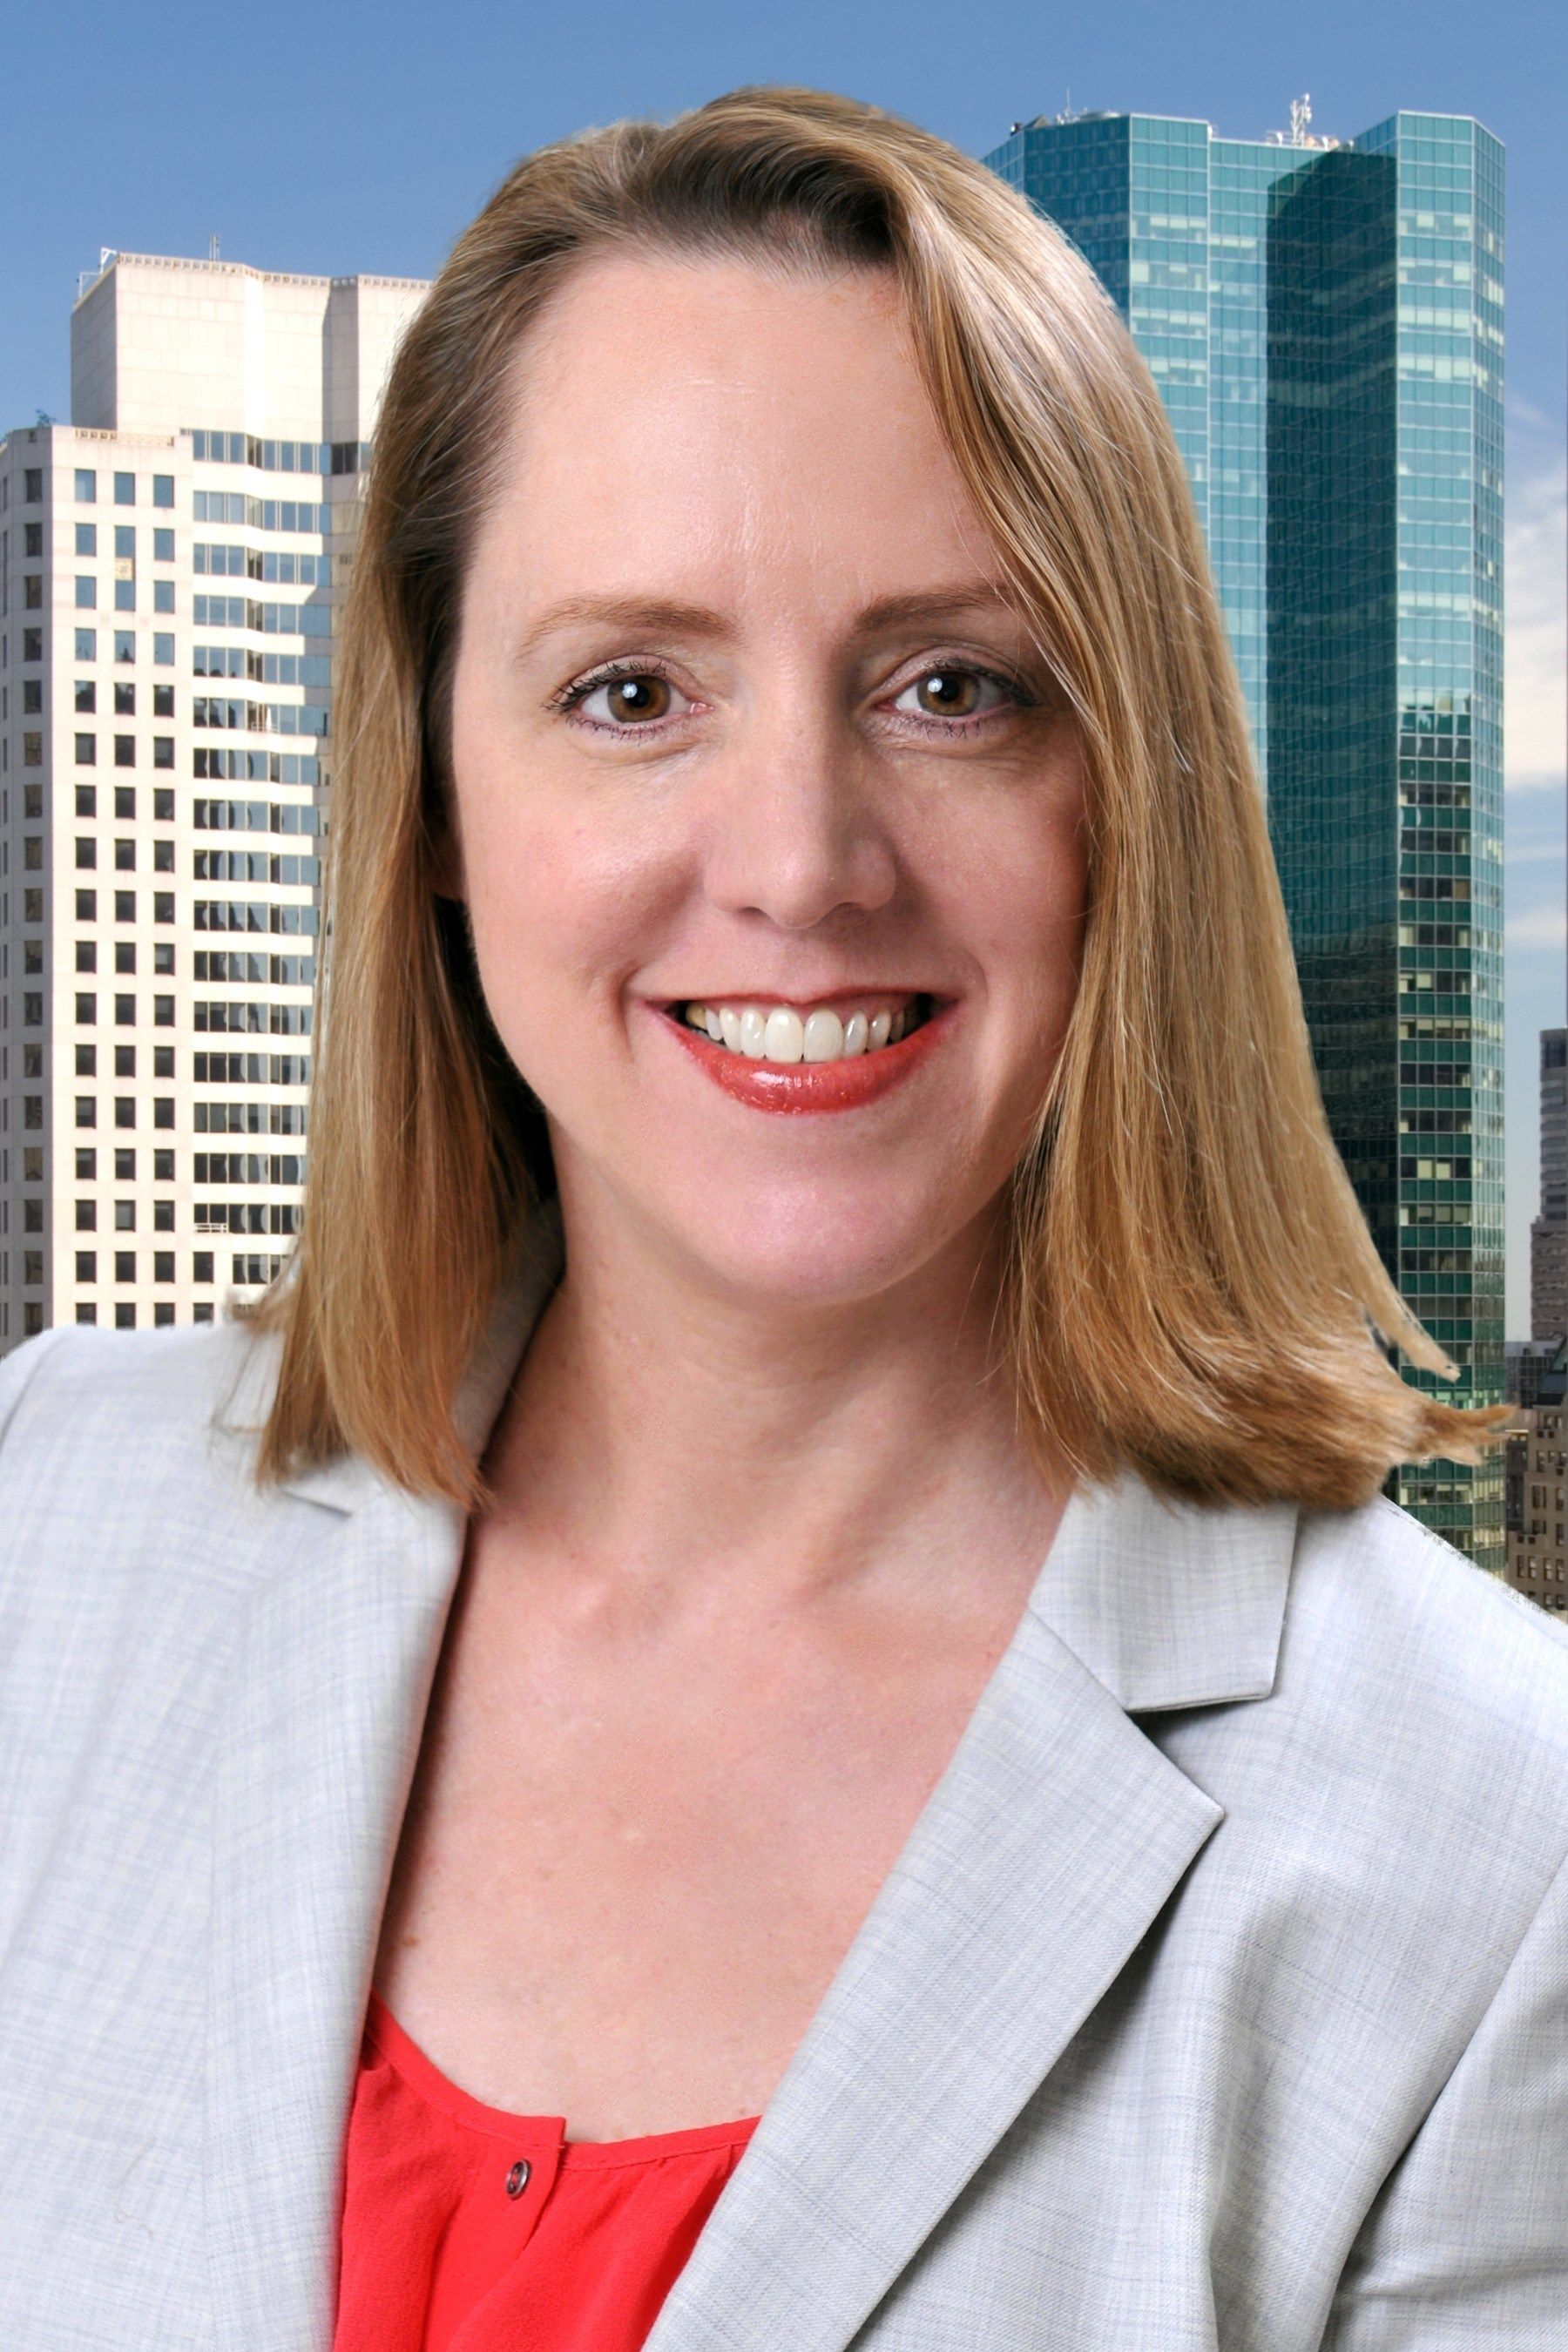 Marcella Ballard, Venable Intellectual Property/Brand protection partner